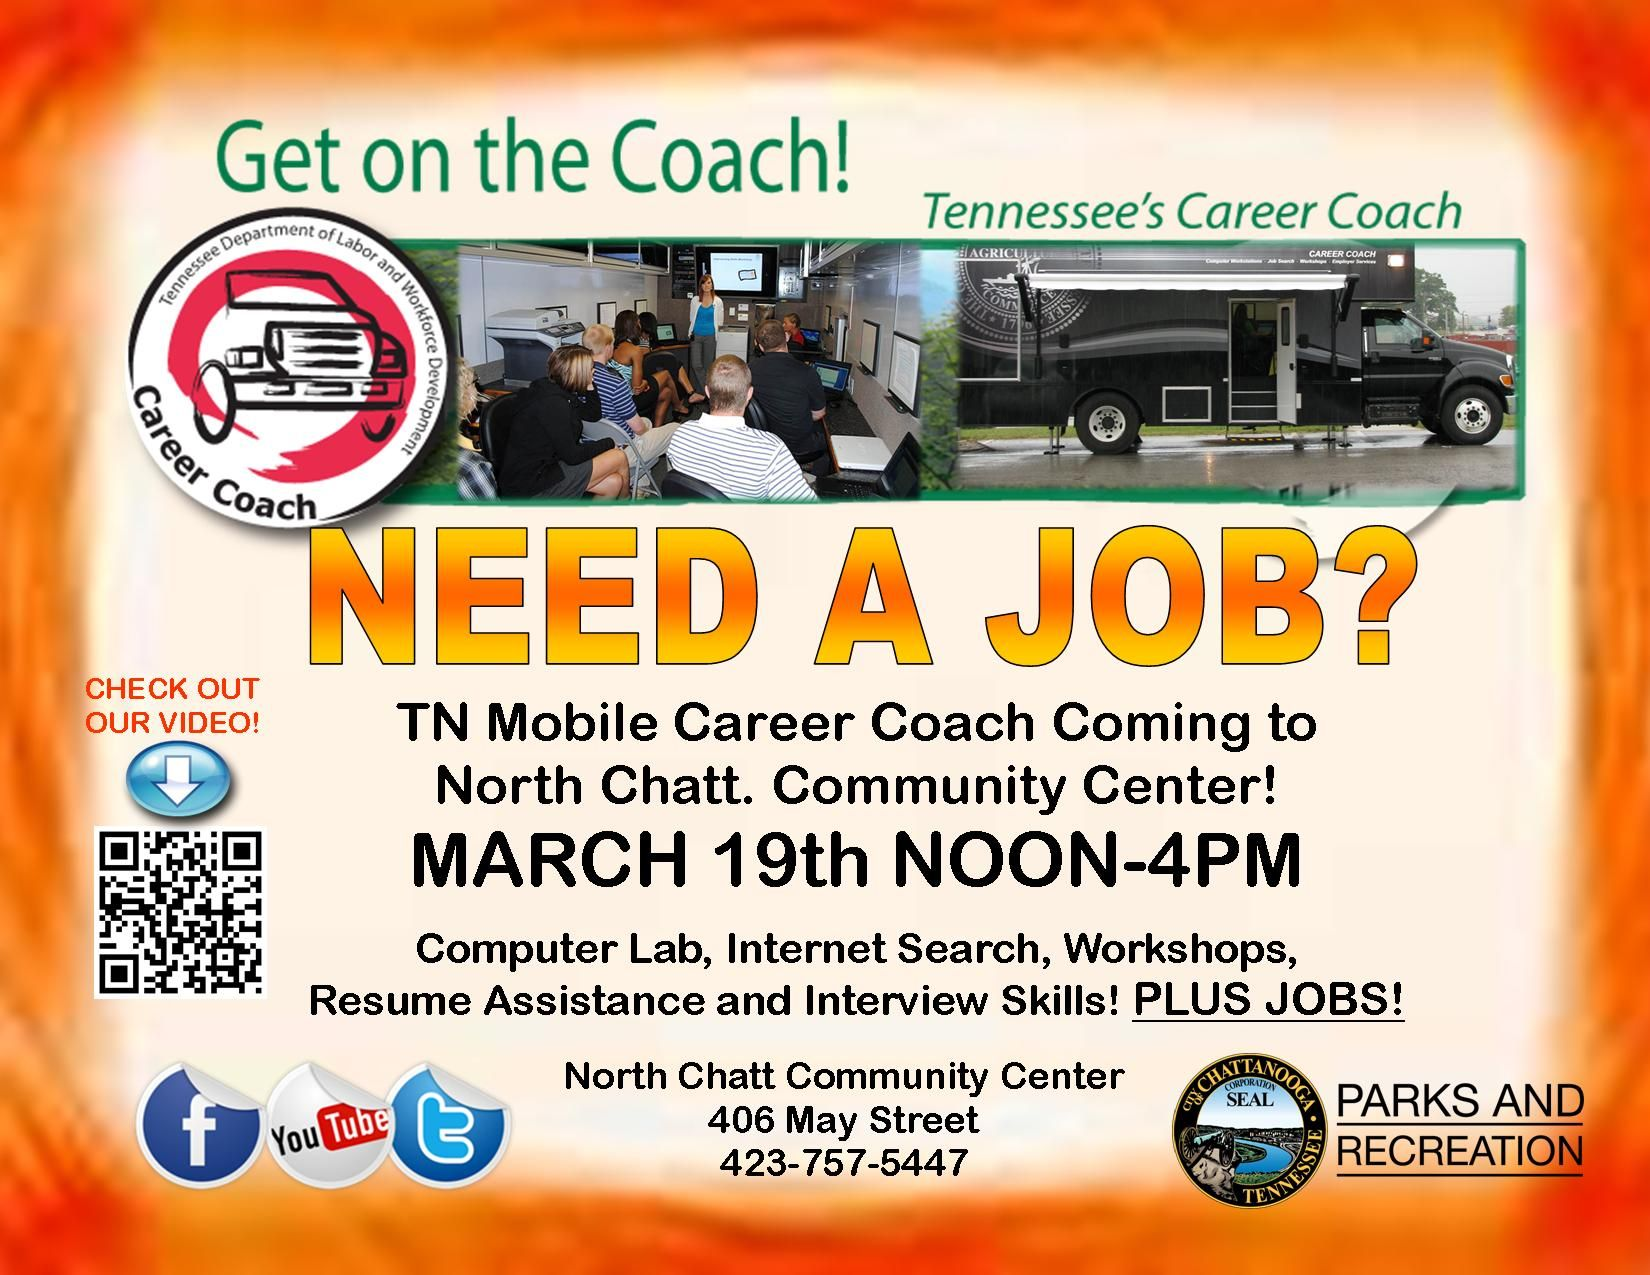 North Chatt Career Coach Career coach, Activities, Need